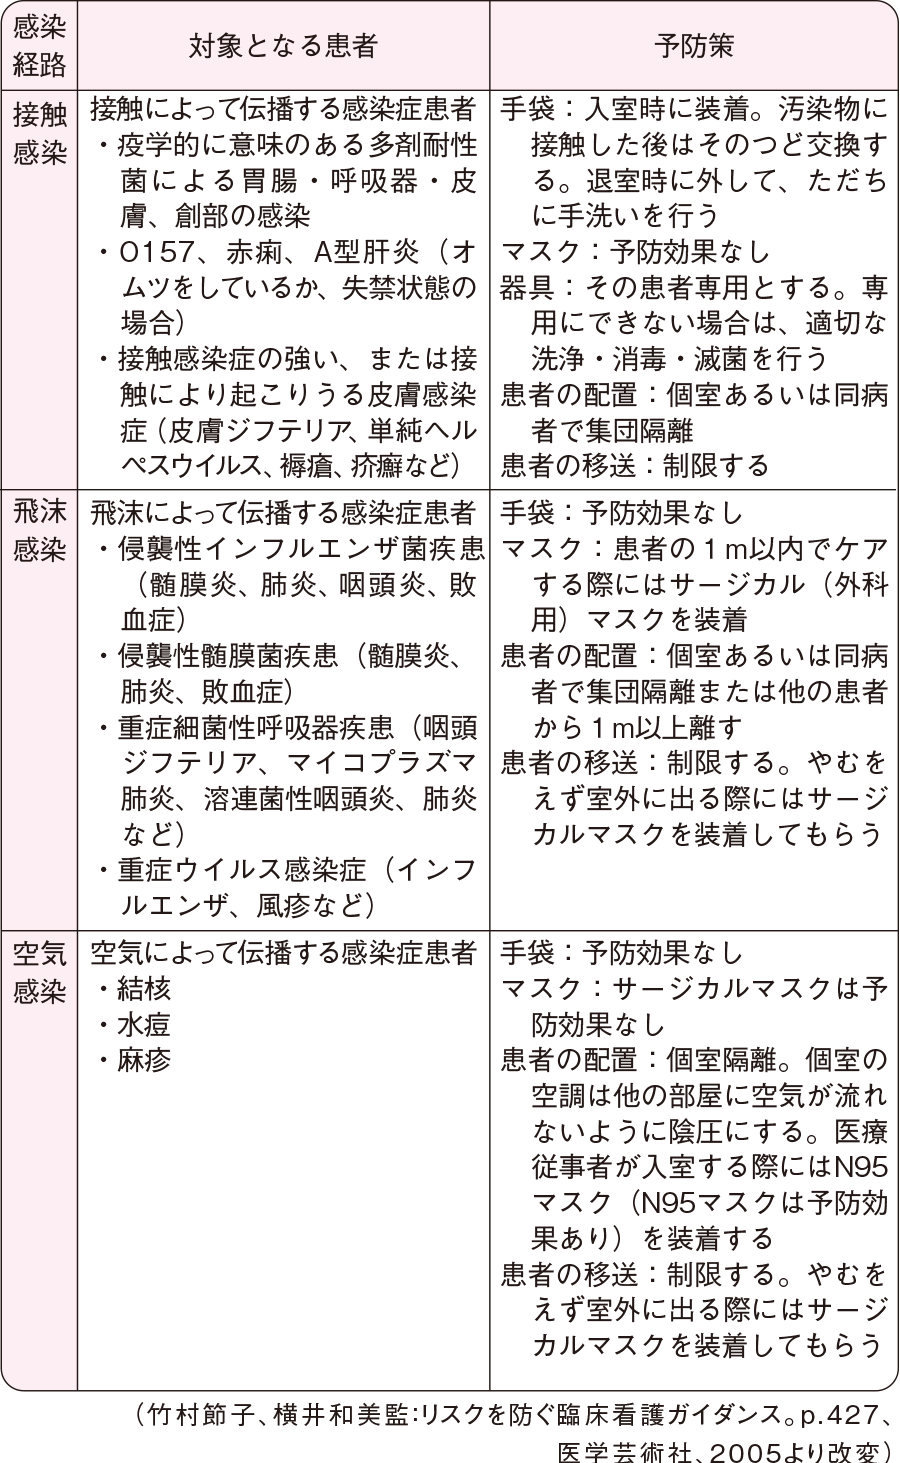 感染経路別の予防策(標準予防策に追加)